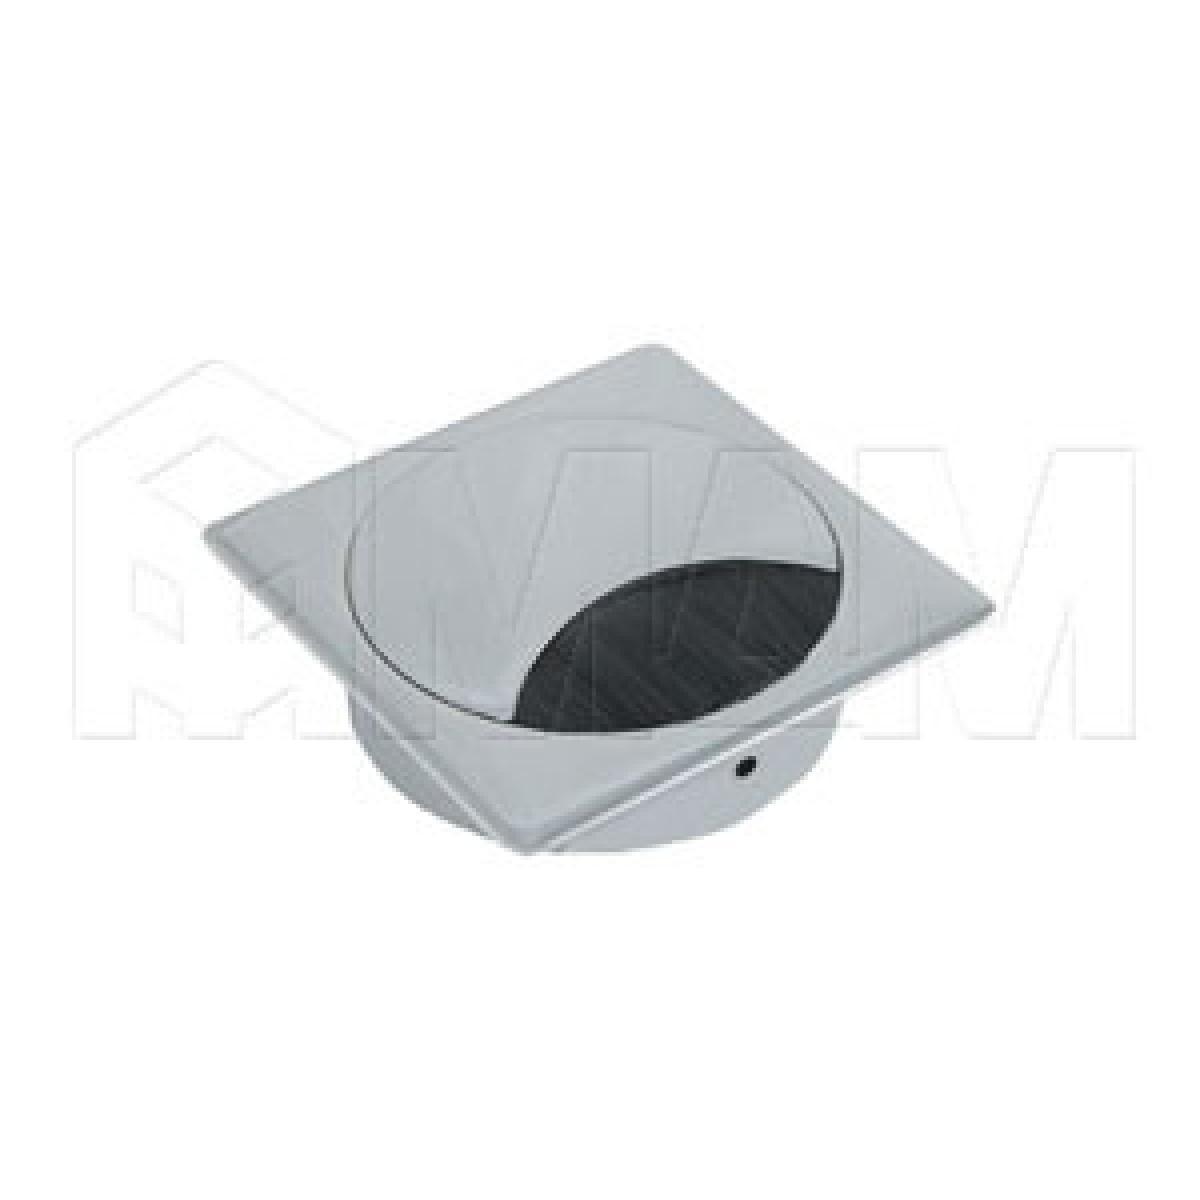 Заглушка кабель-канала, металлическая, квадратная, 90х90 мм, хром матовый